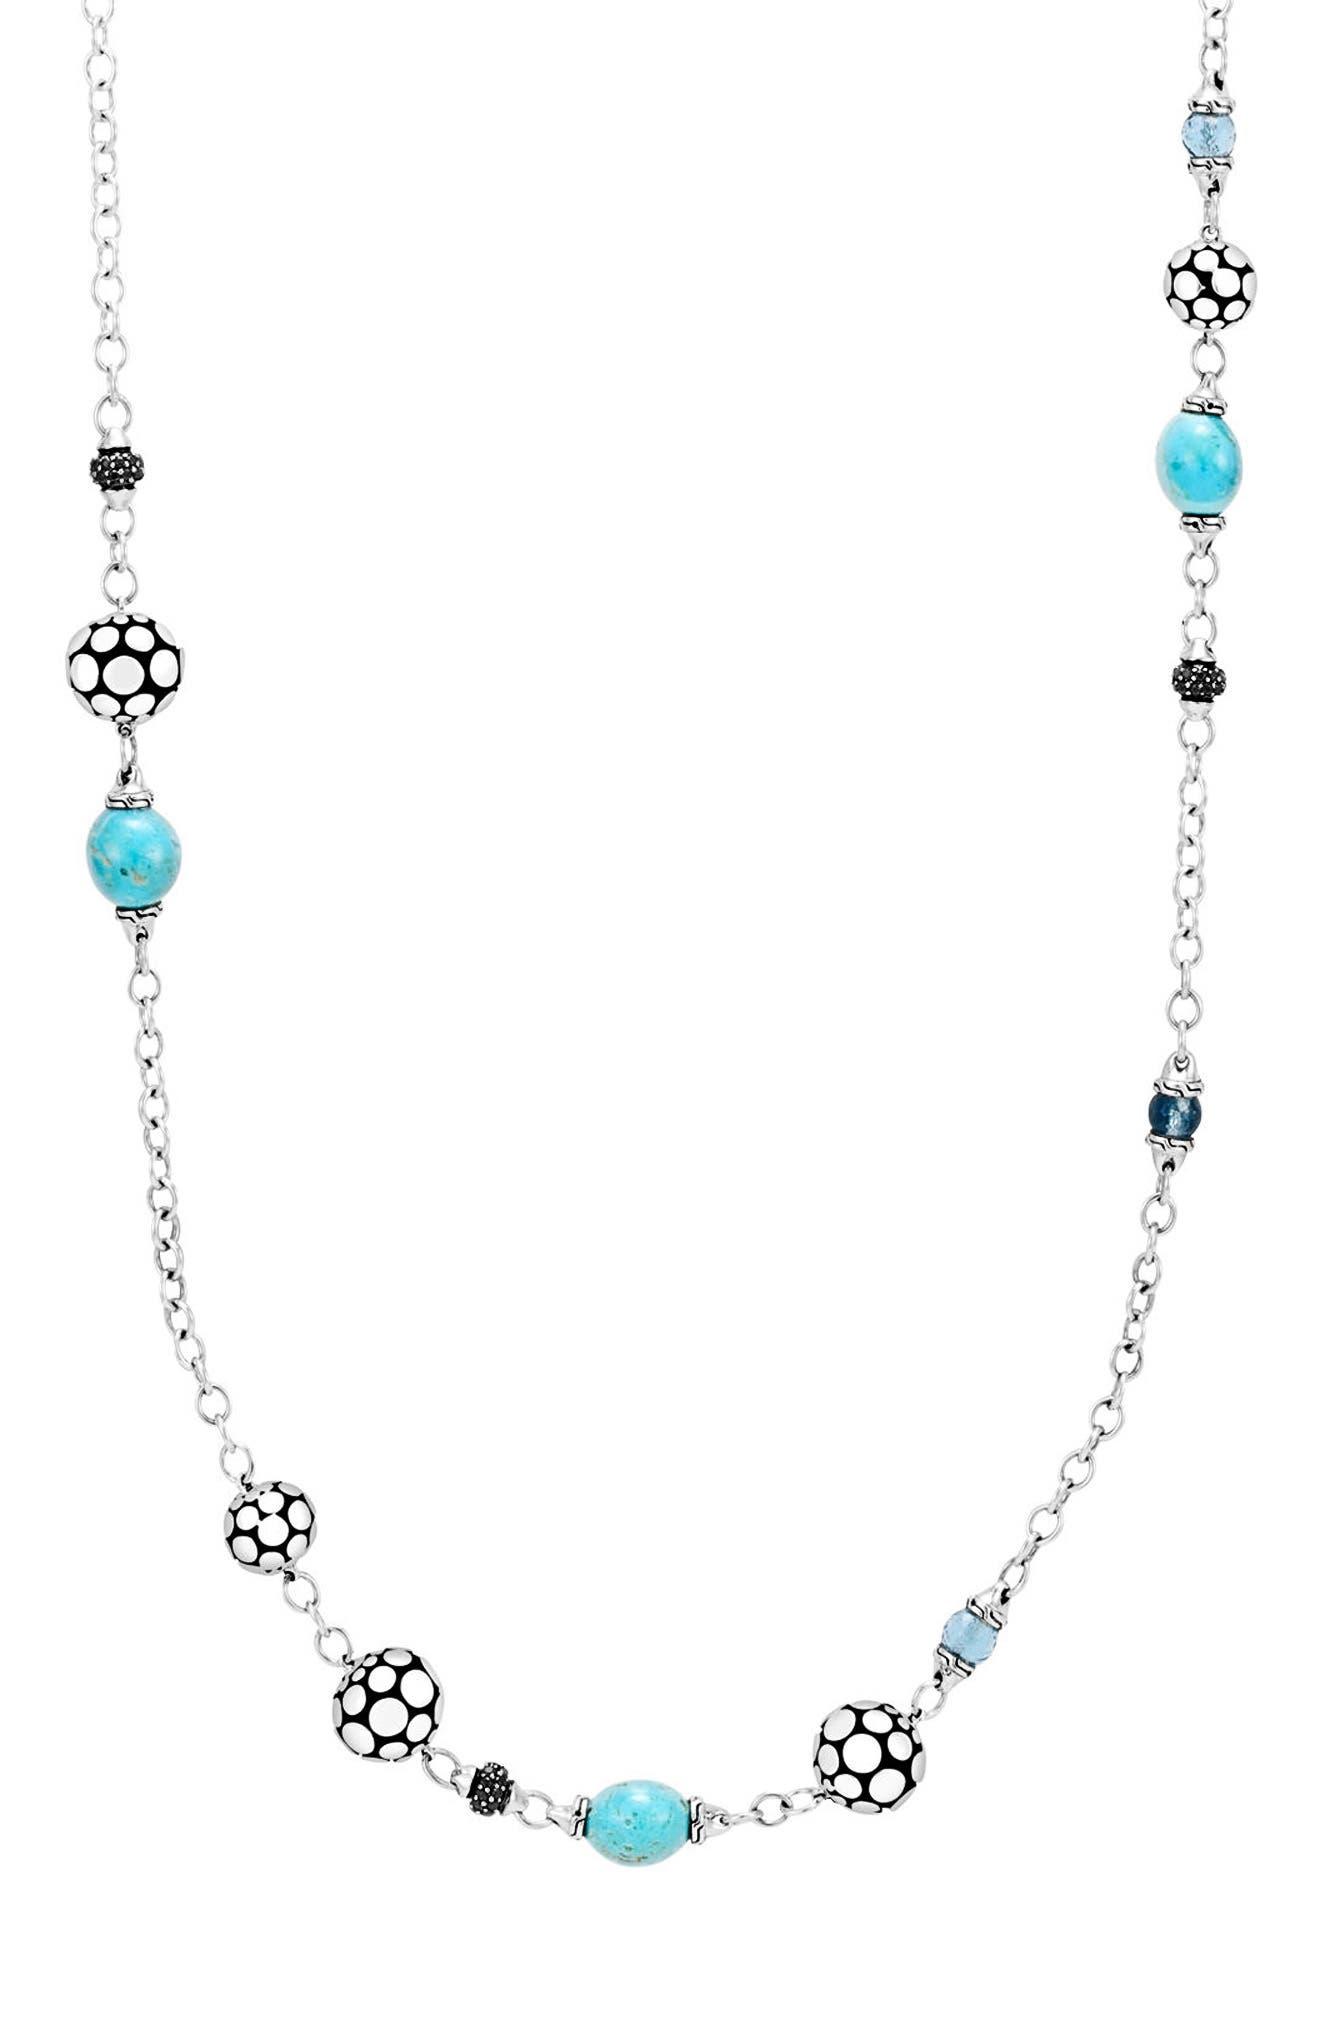 Dot Sautoir Station Necklace,                         Main,                         color, Silver/ Turquoise